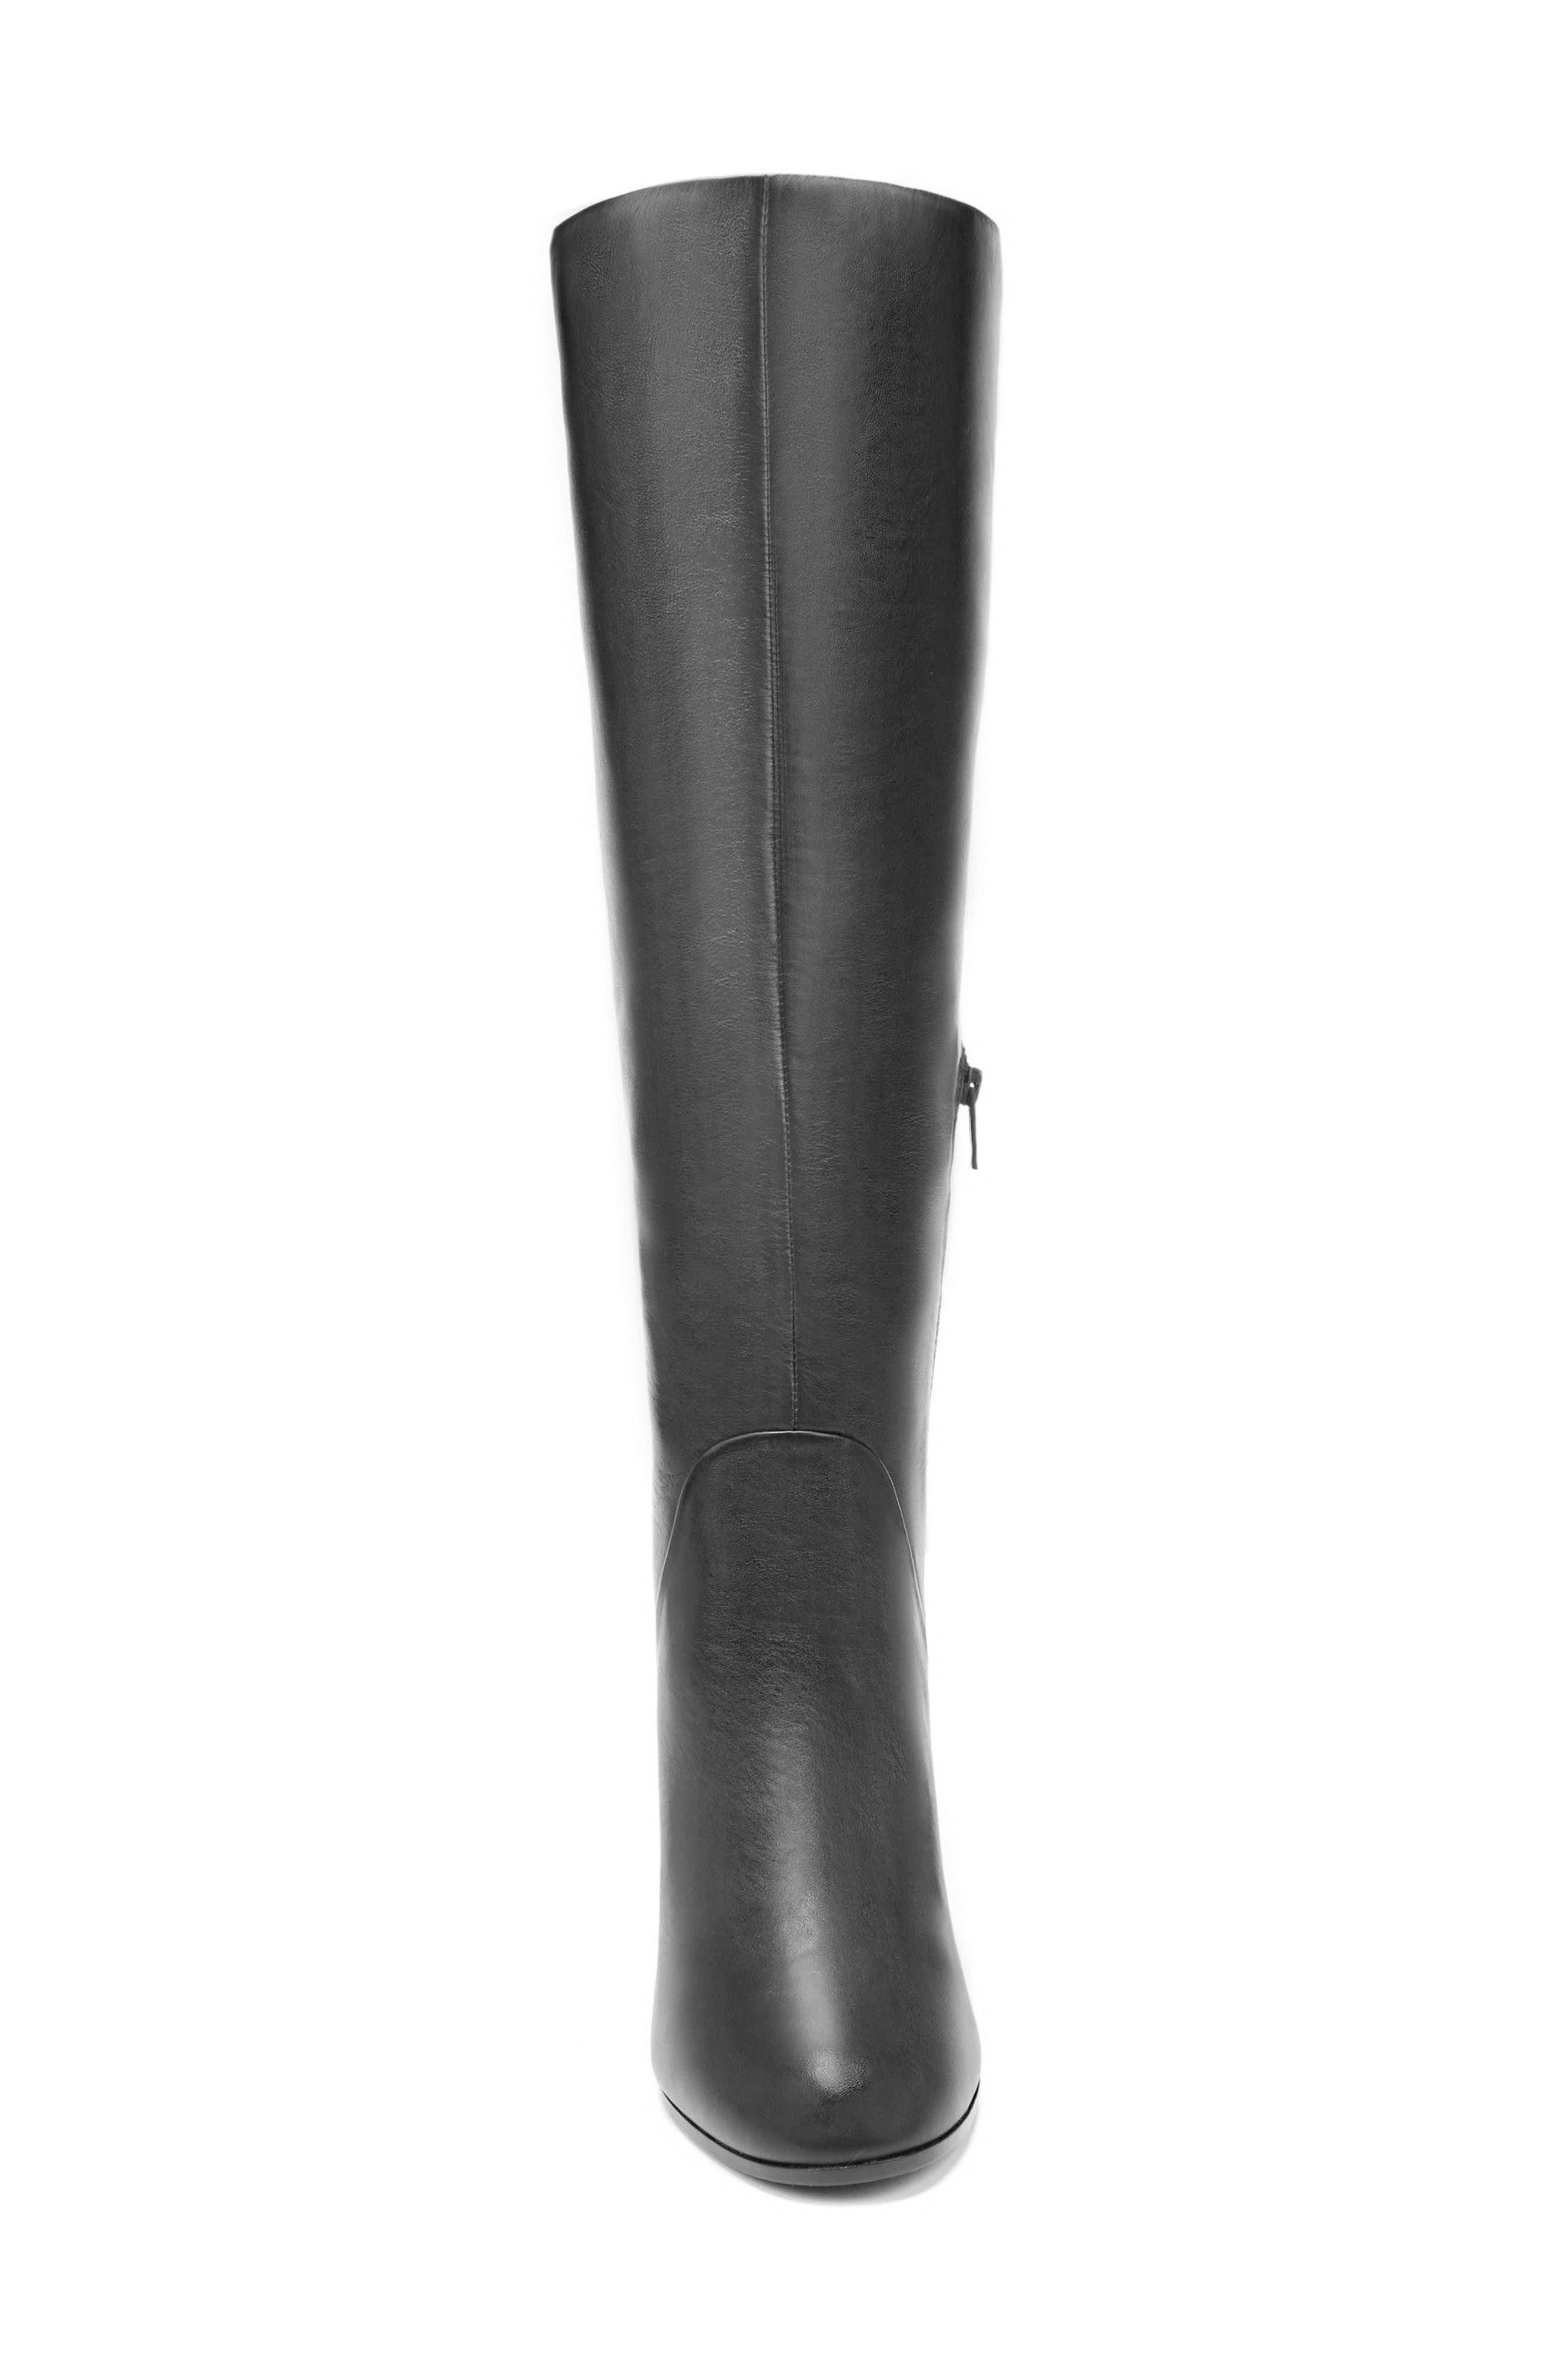 Soho Knee High Boot,                             Alternate thumbnail 4, color,                             Onyx Leather